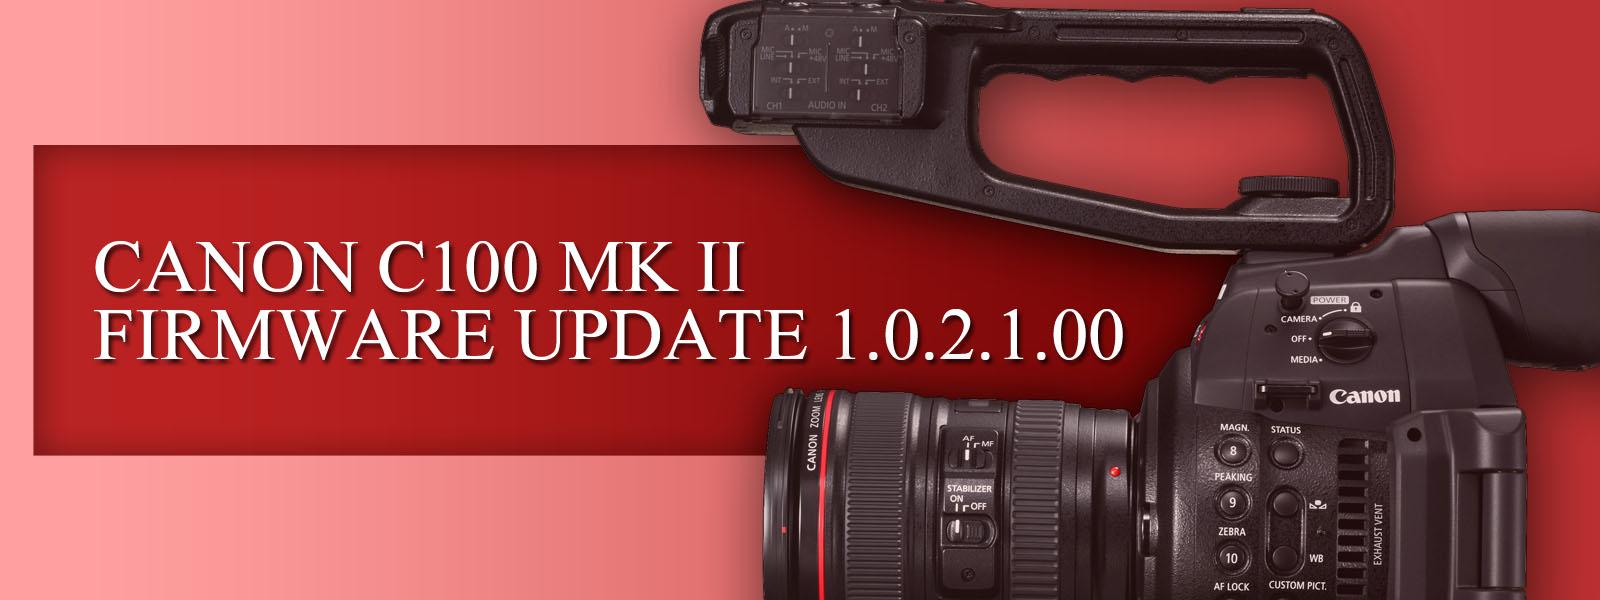 Canon EOS C100 MK II Firmware Update 1.0.2.1.00